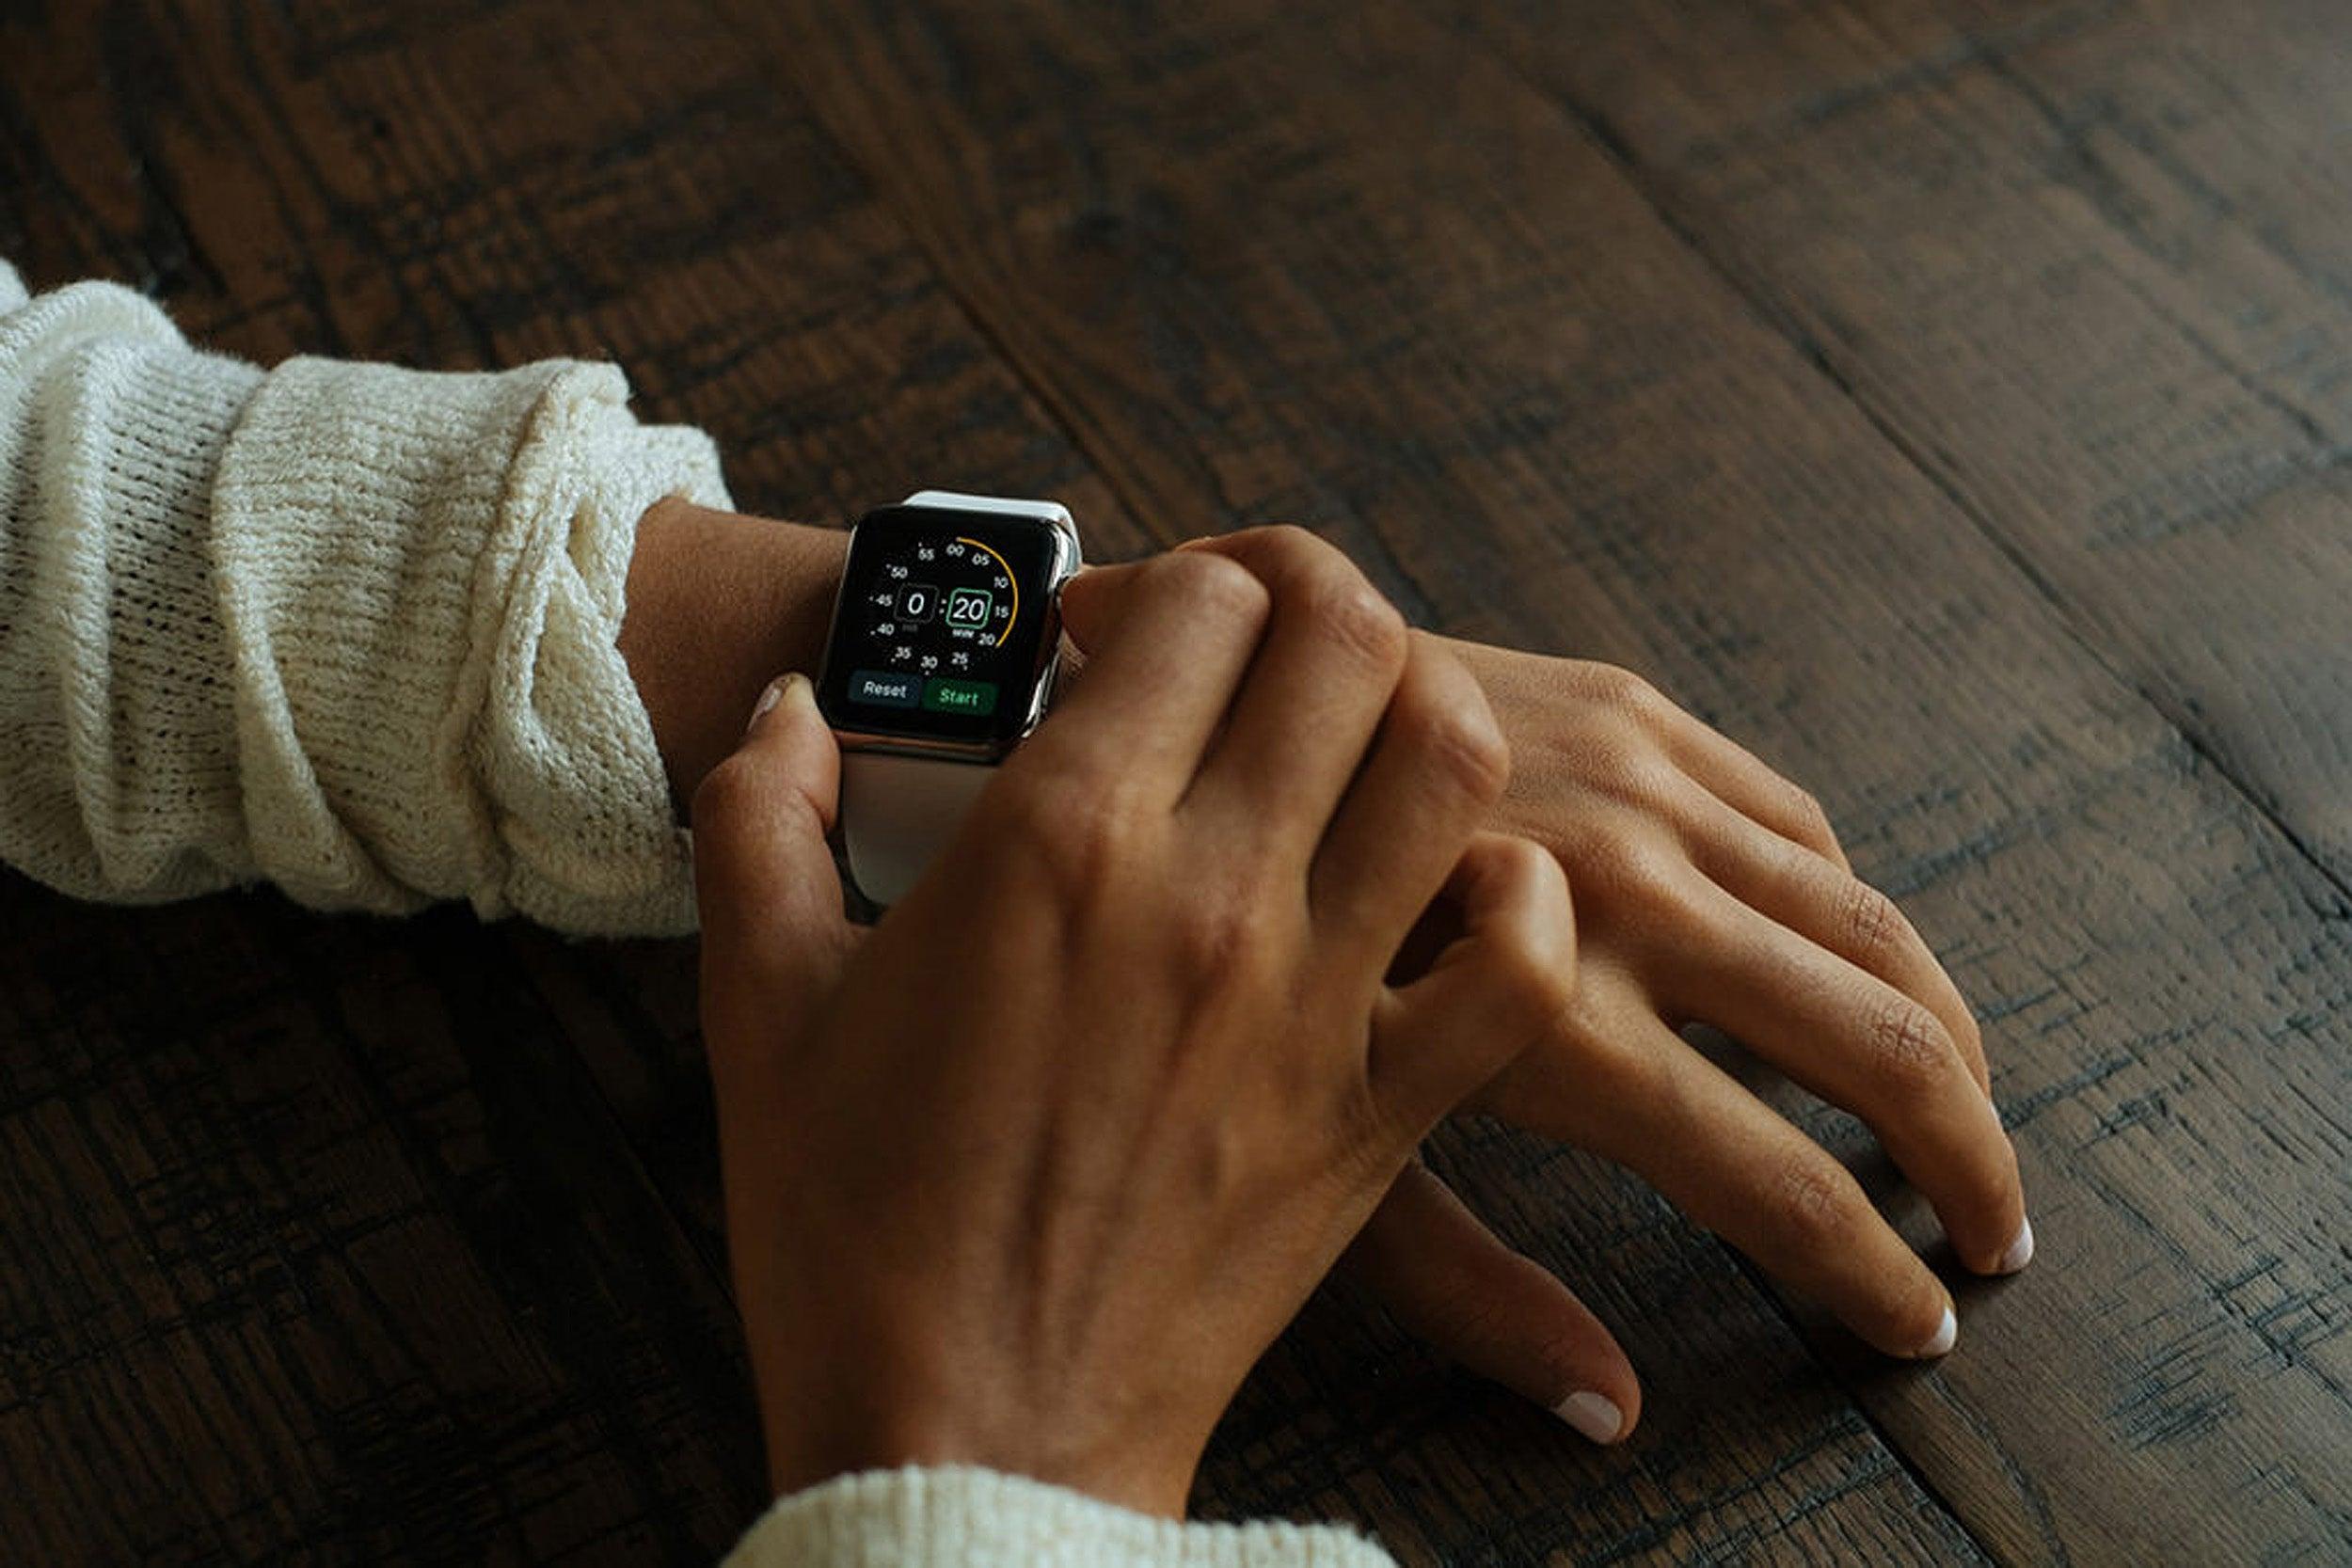 Person wearing watch.